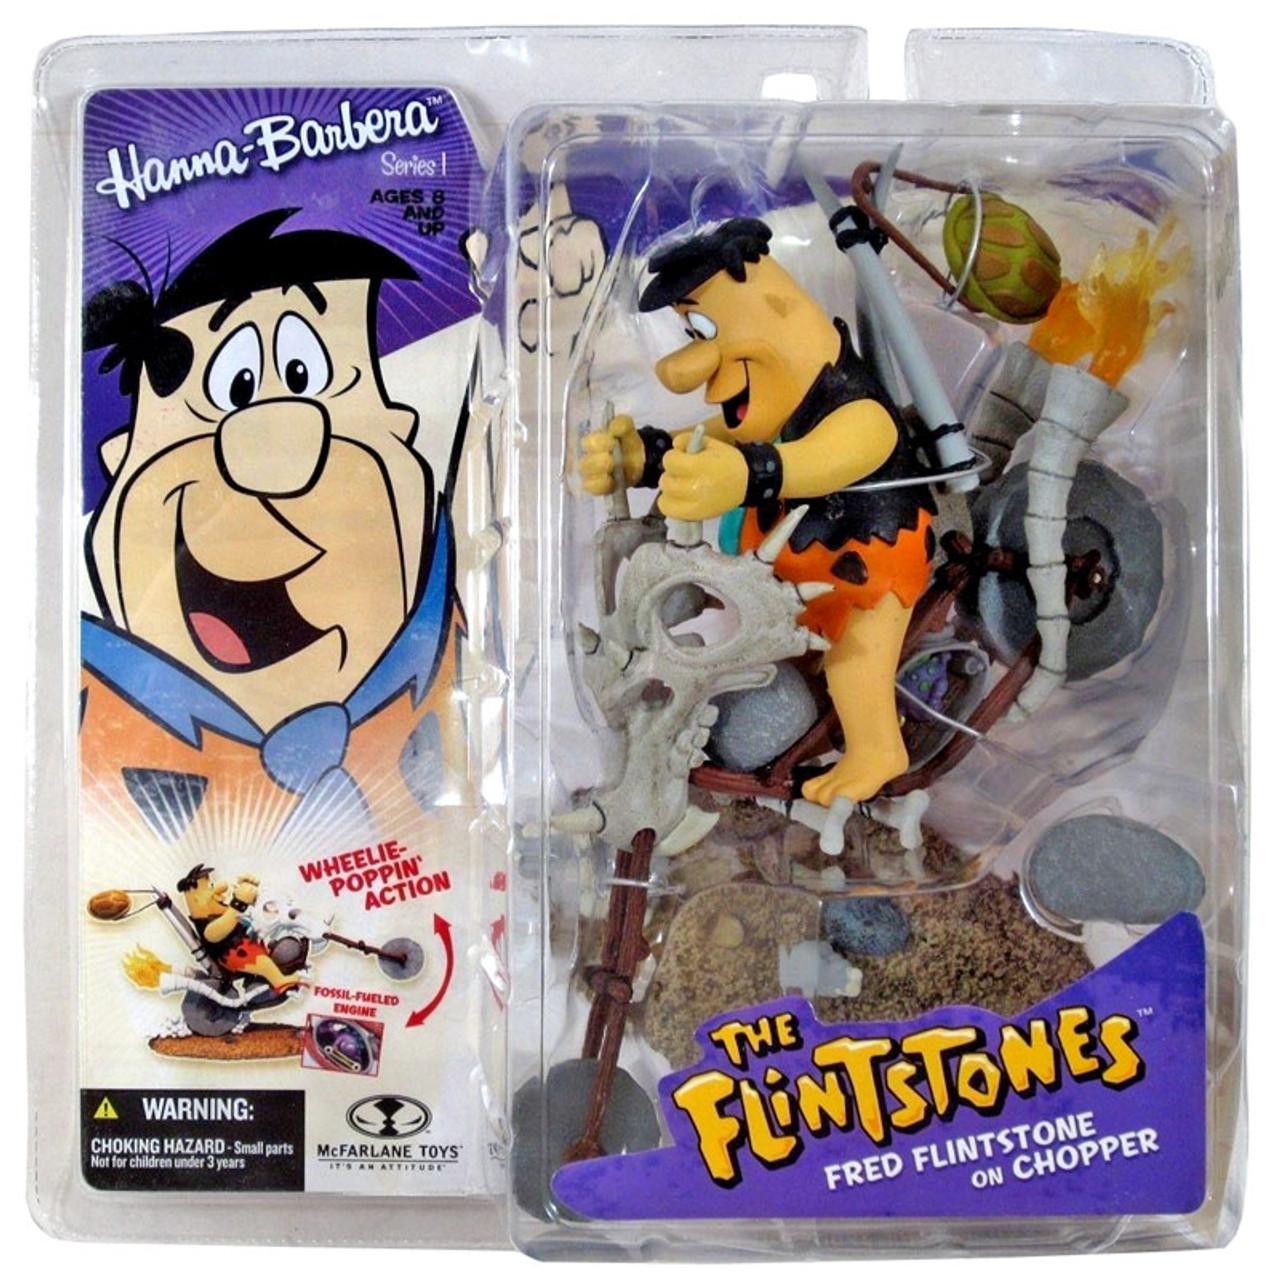 McFarlane Toys Hanna-Barbera The Flintstones Fred Flintstone on Chopper Action Figure